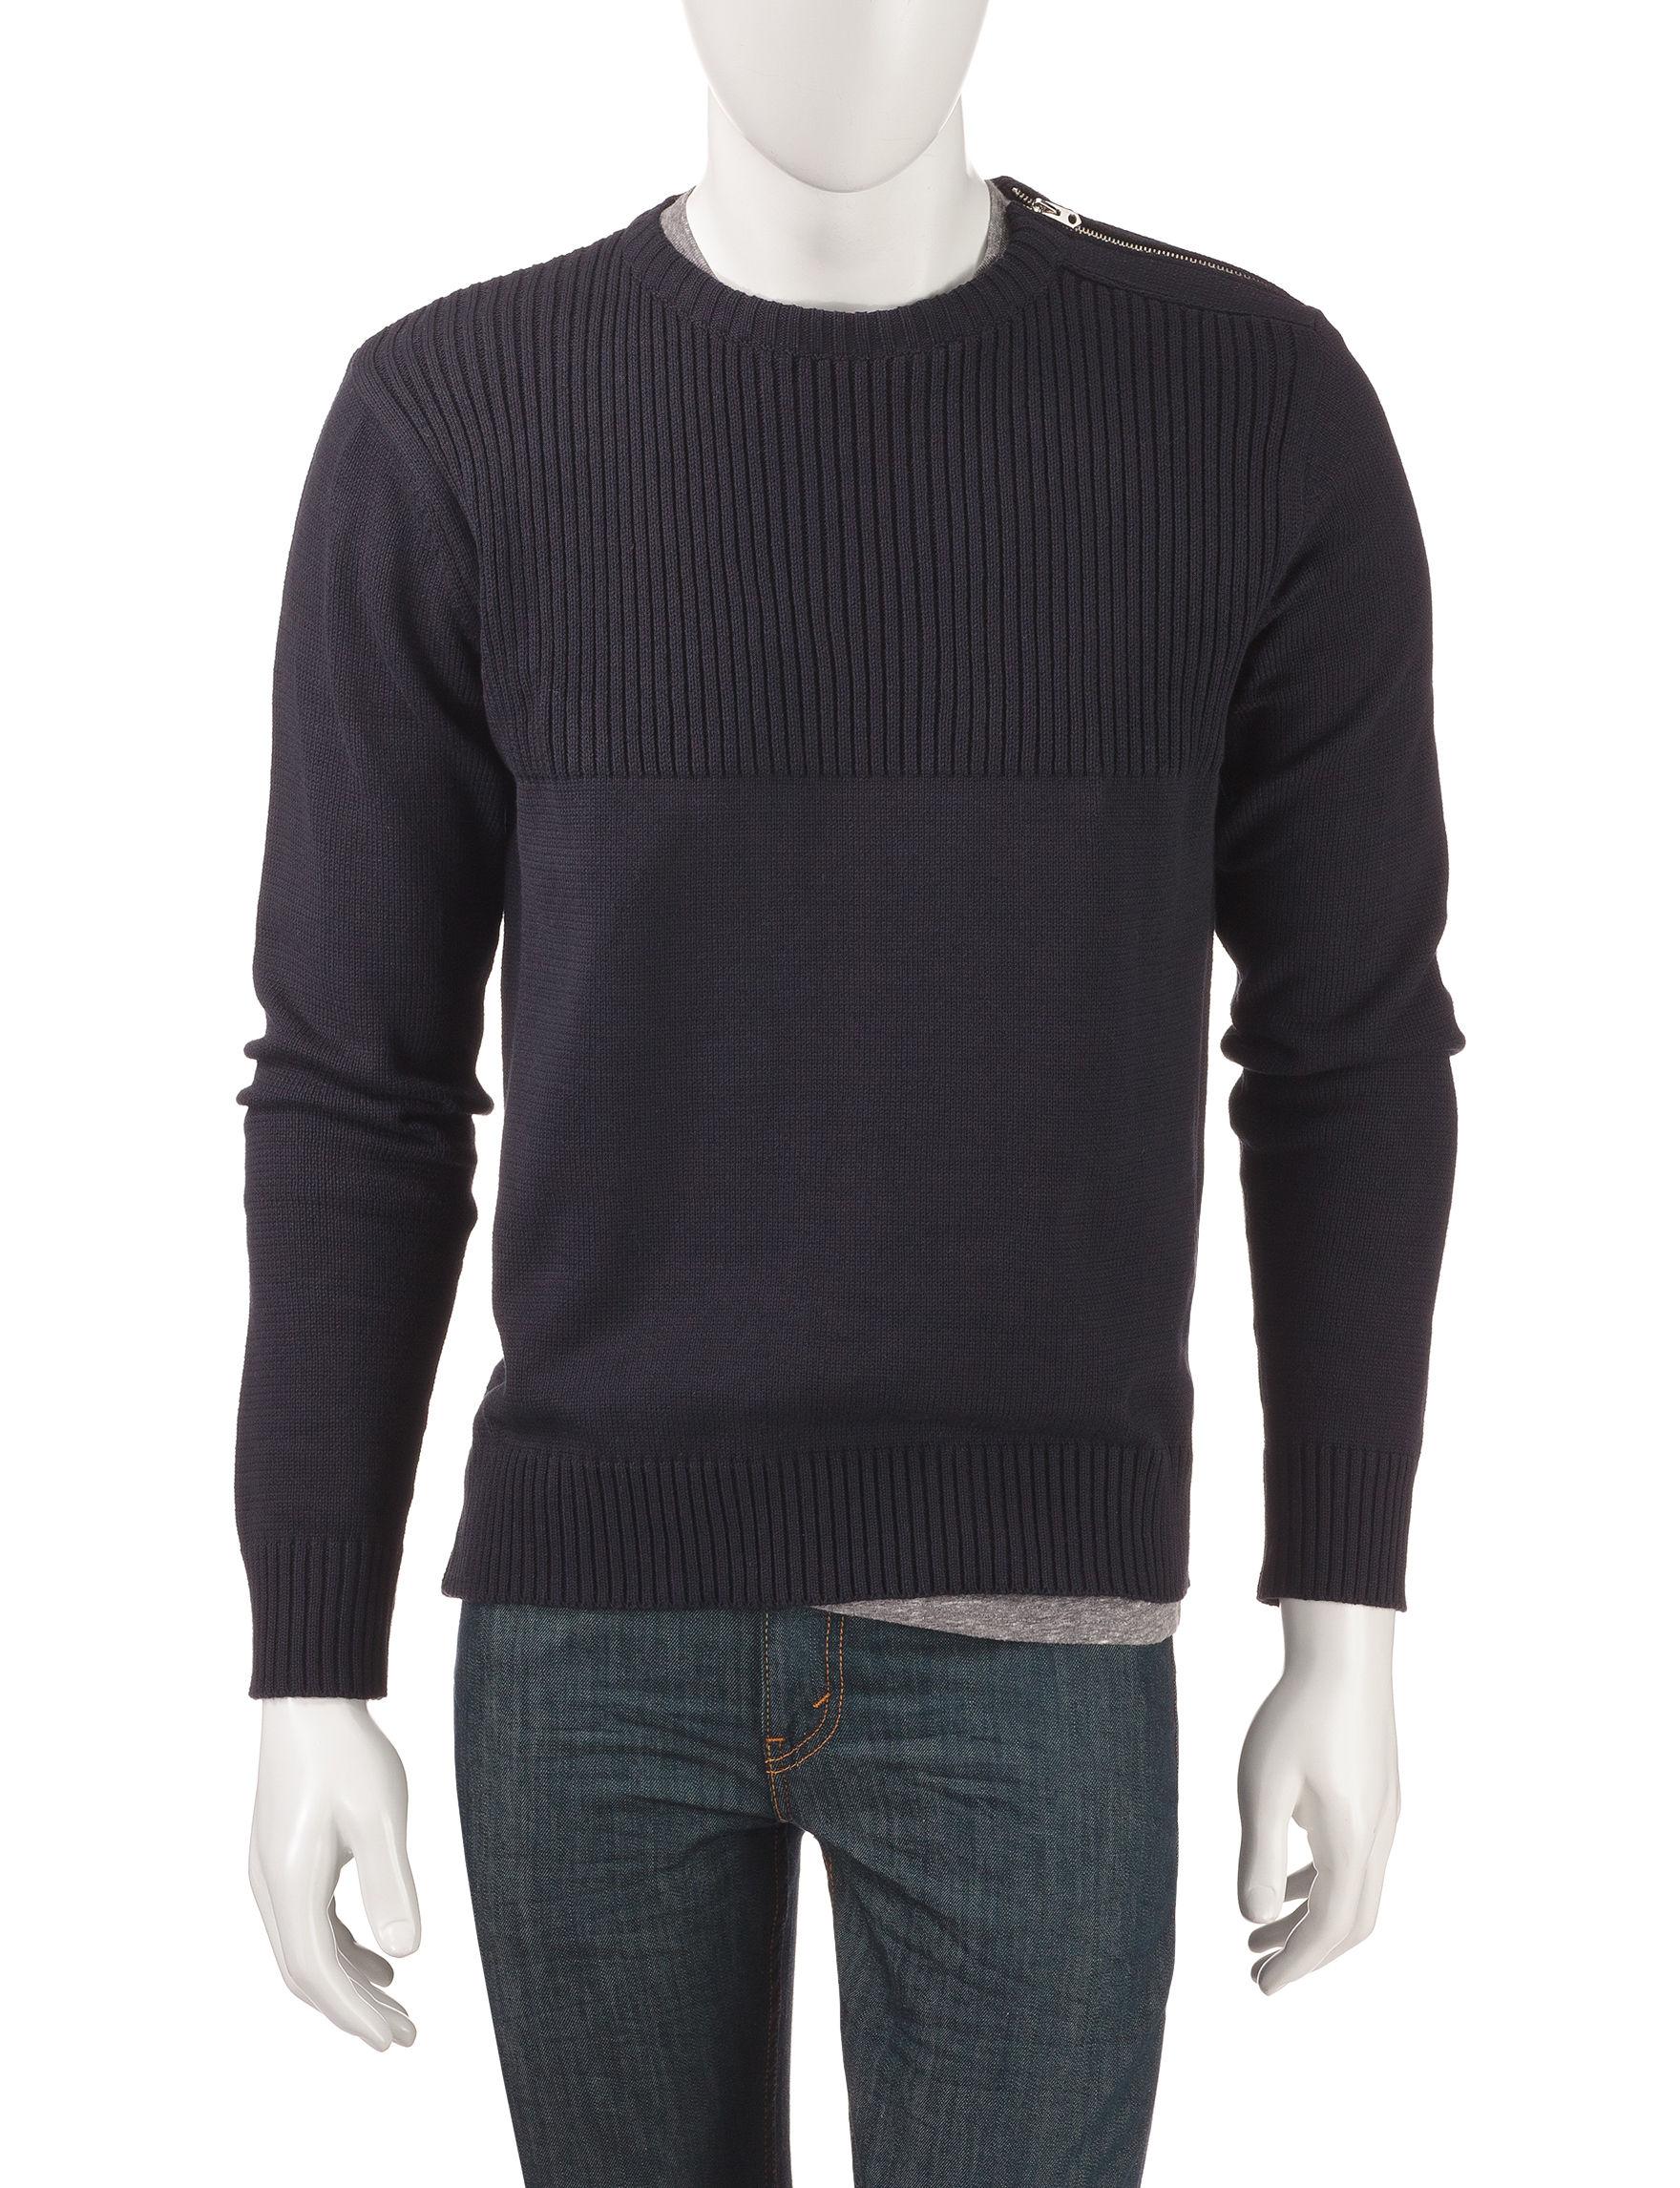 Signature Studio Navy Sweaters